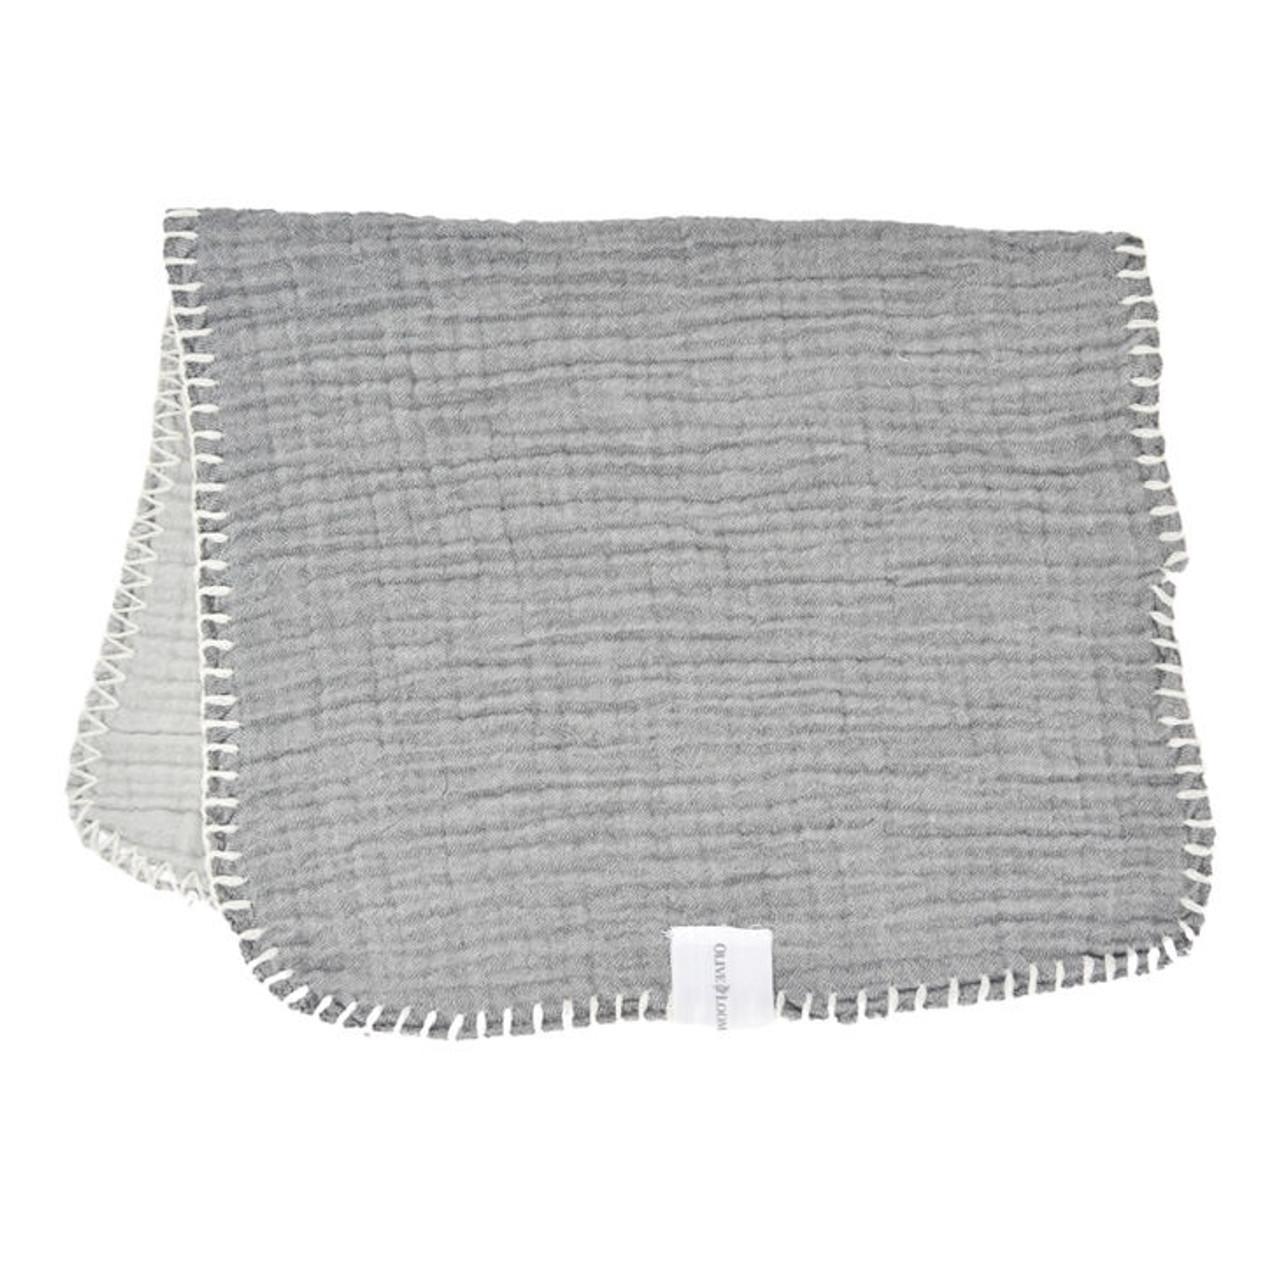 Super Soft Turkish Face Cloth - Grey